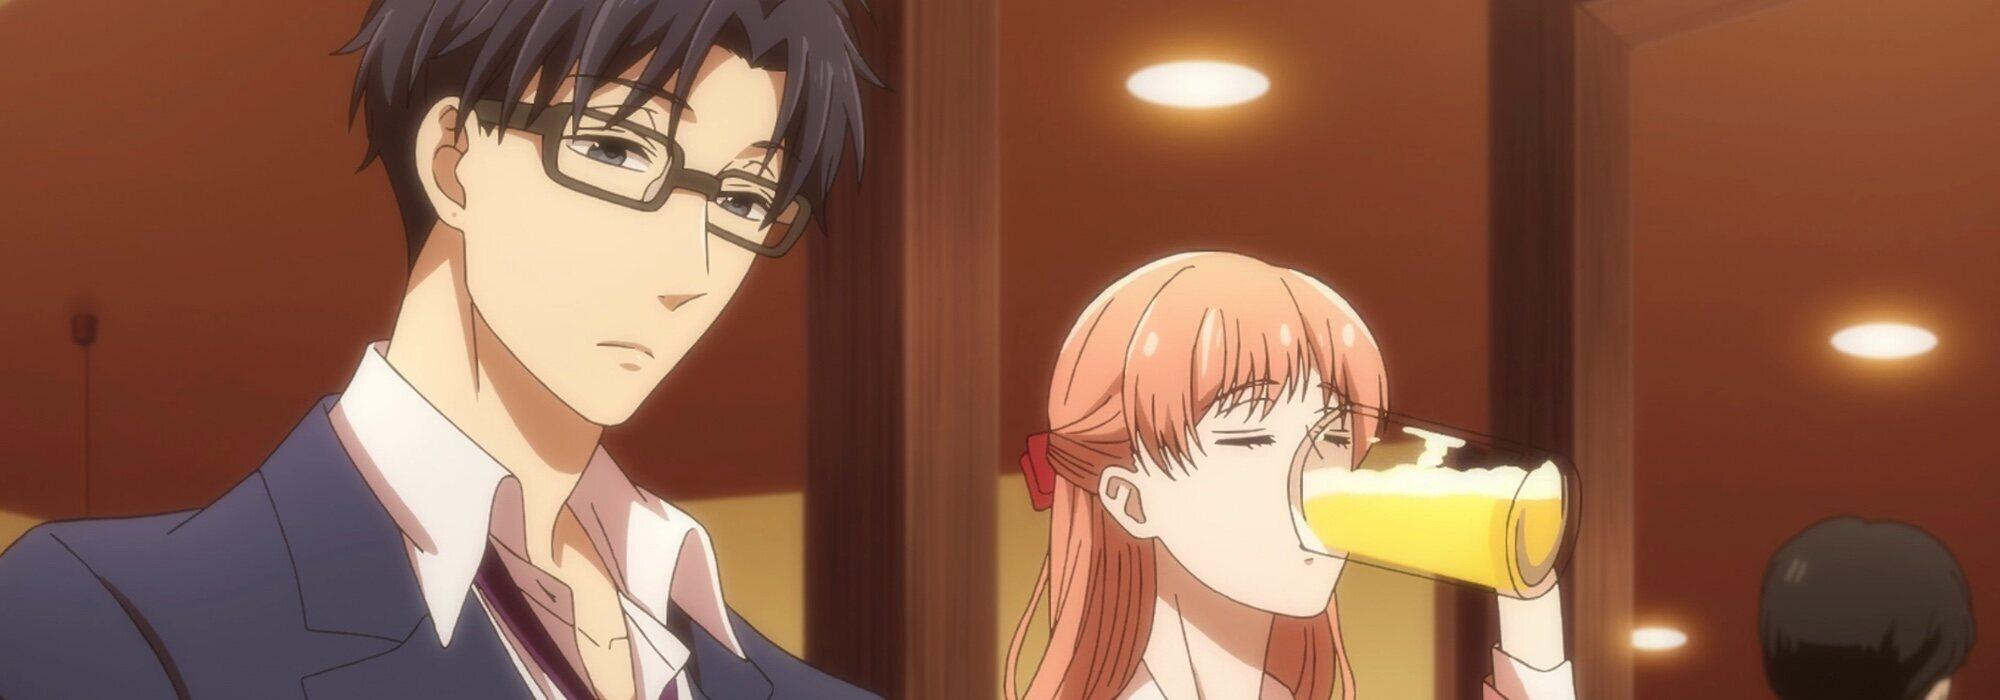 Wotakoi: Qué difícil es el amor para un otaku